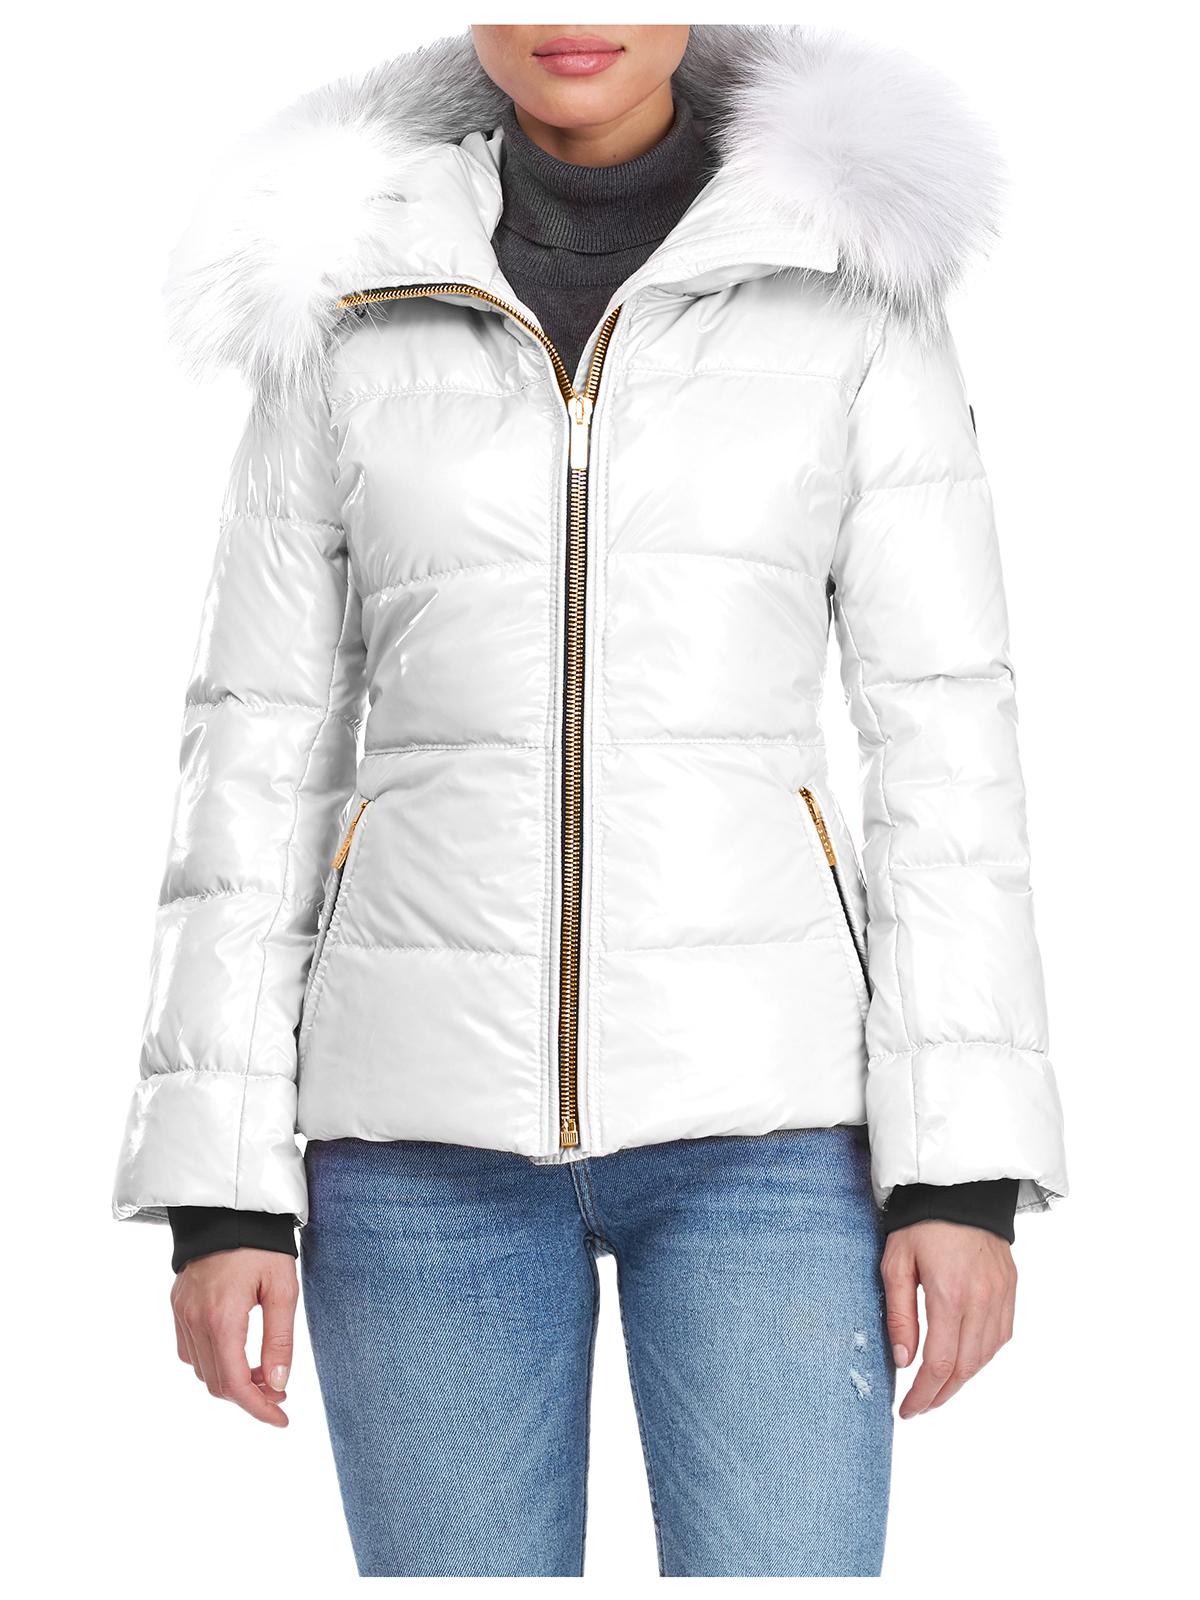 Gorski Woman's White Apres-Ski Shiny Technical Fabric with Detachable Fox Fur Trimmed Hood